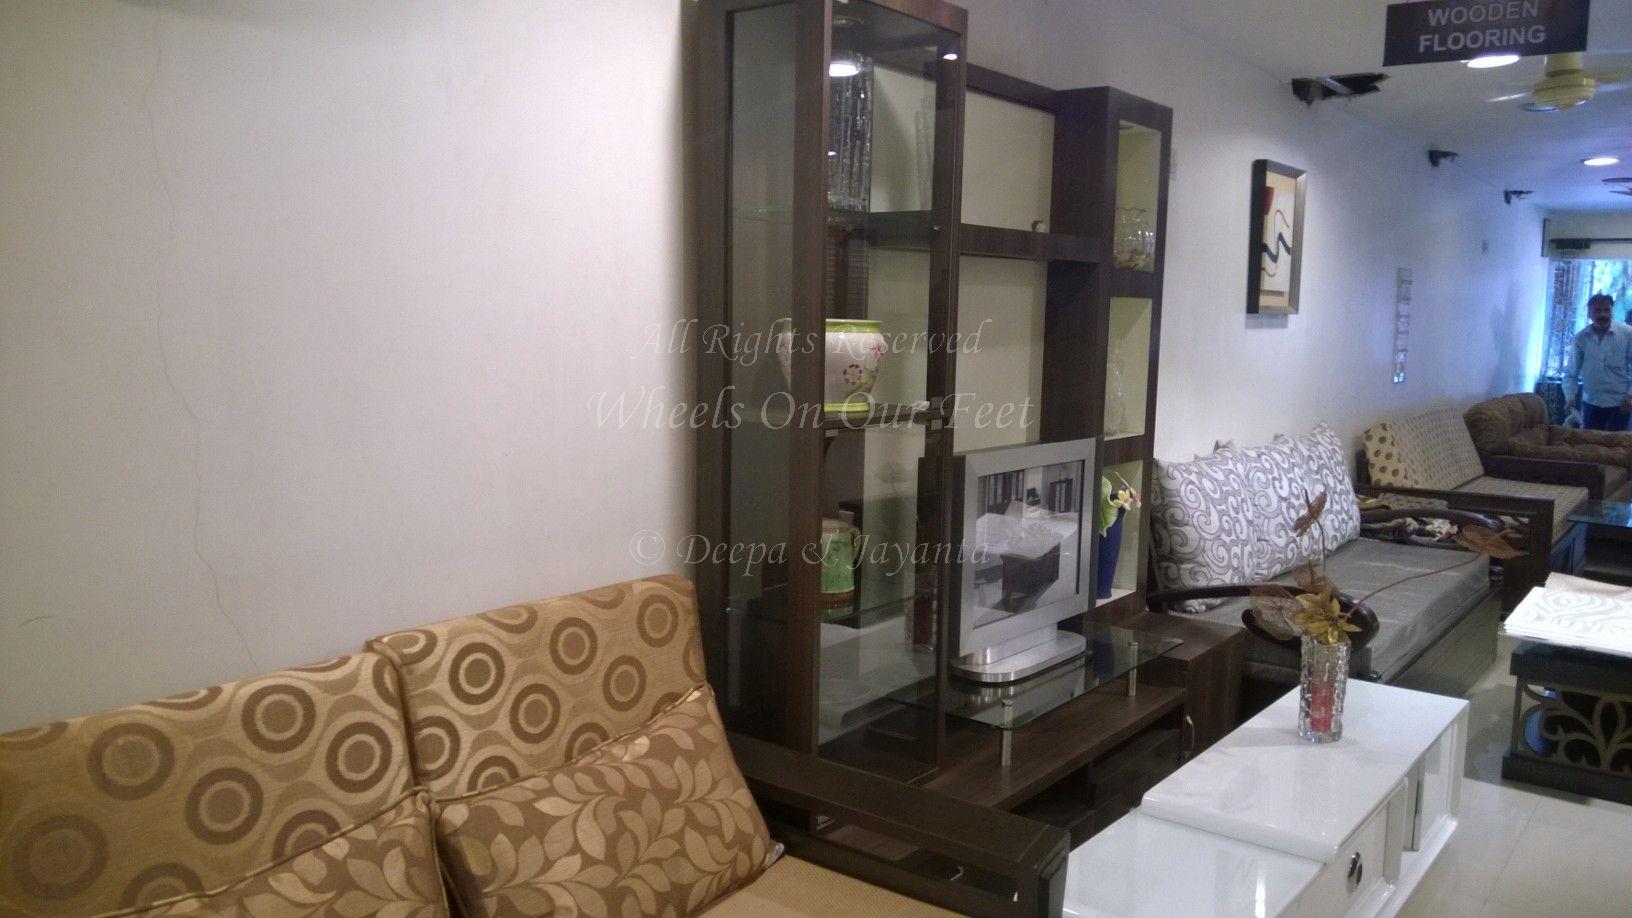 sofa fabric suppliers in mumbai cama ikea market baci living room